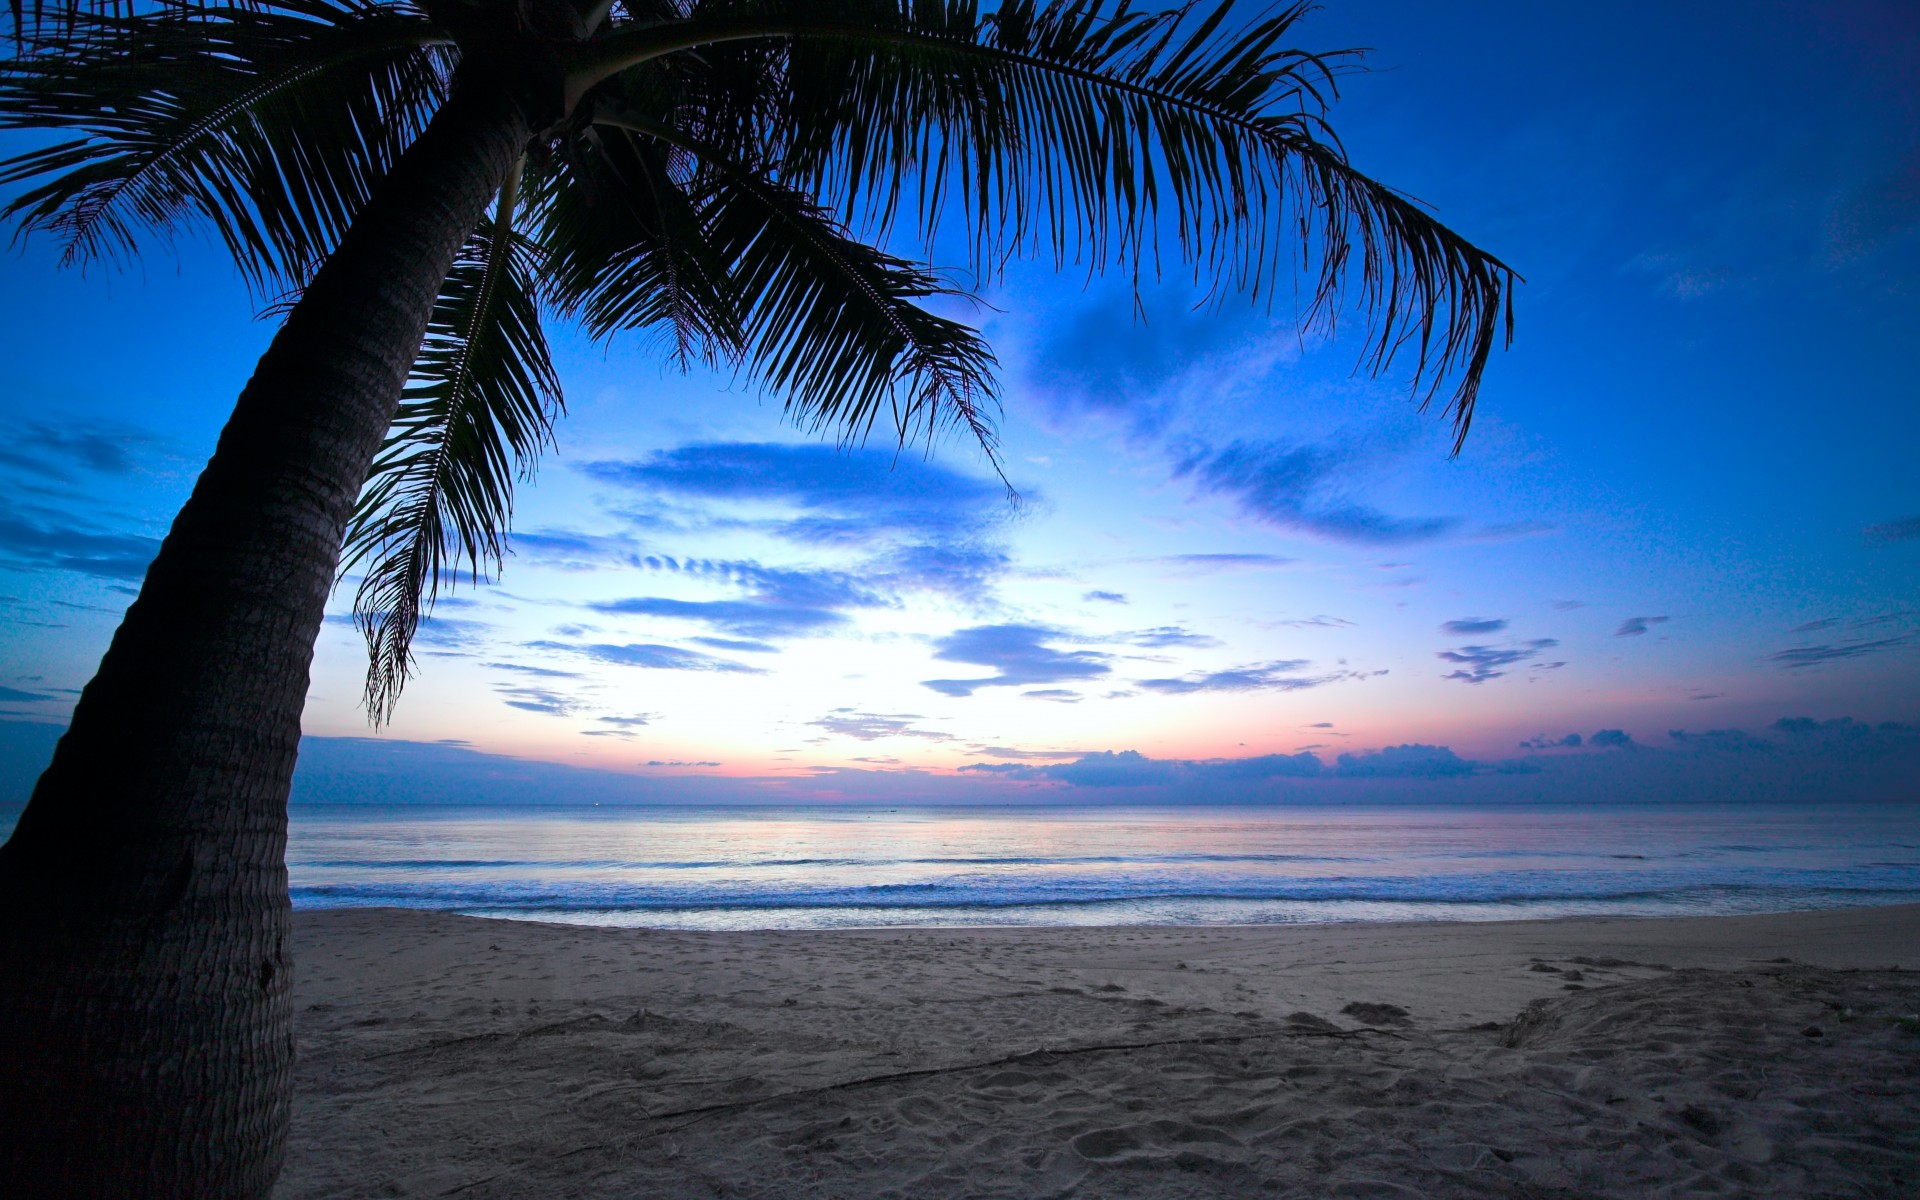 Tropical Sunset Palm Tree HD Wallpaper 1920x1200